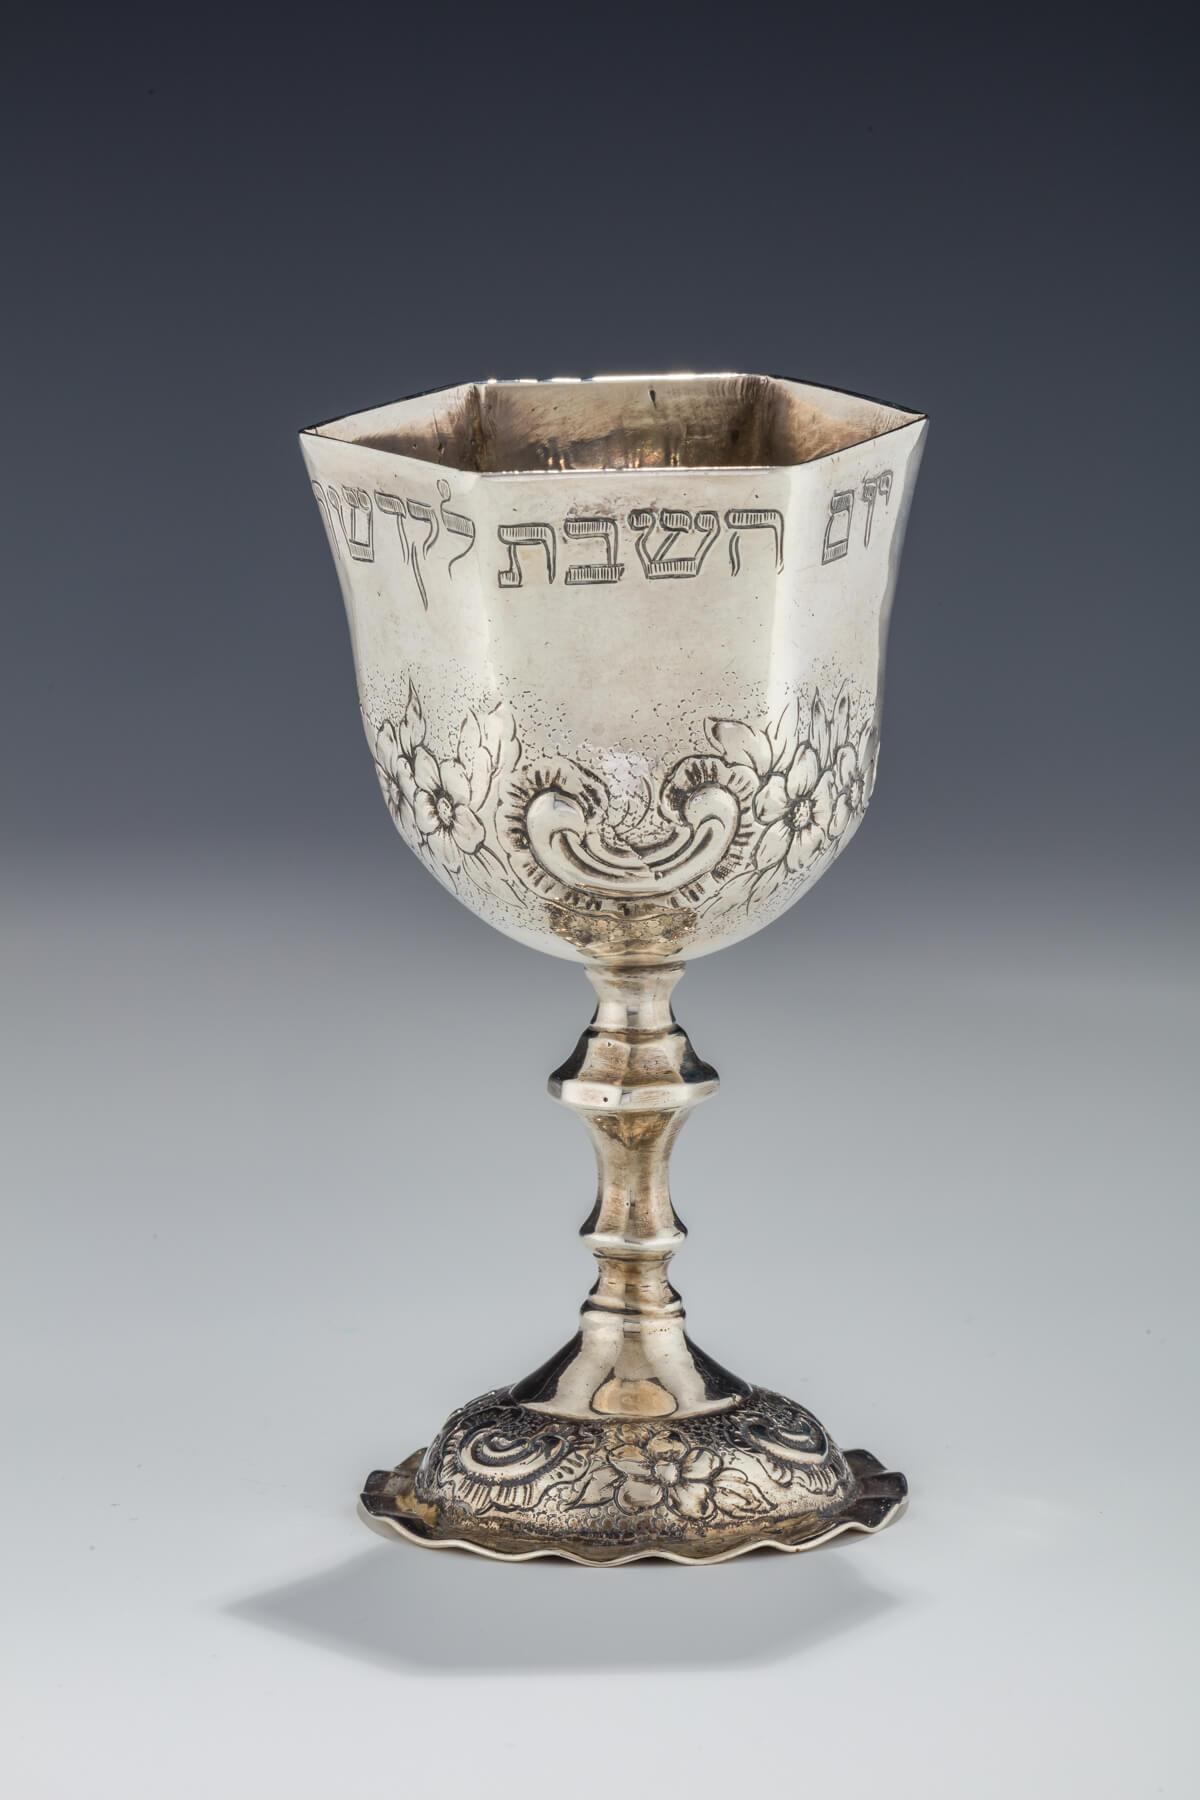 045. A Silver Kiddush Goblet